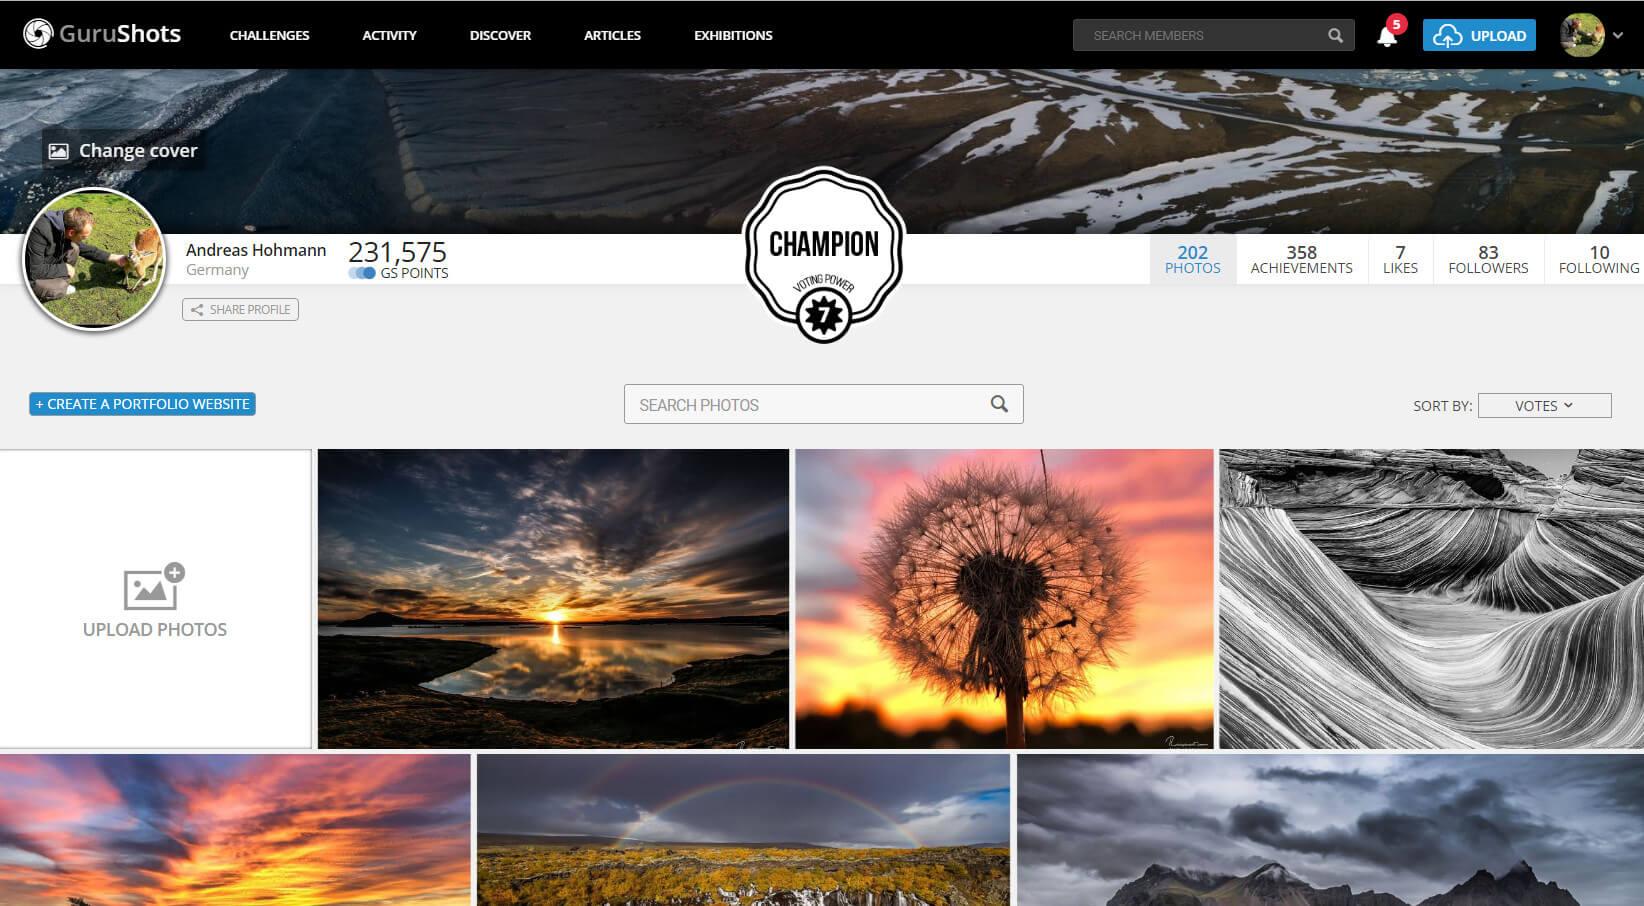 Das eigene Profil in der GuruShots Fotocommunity